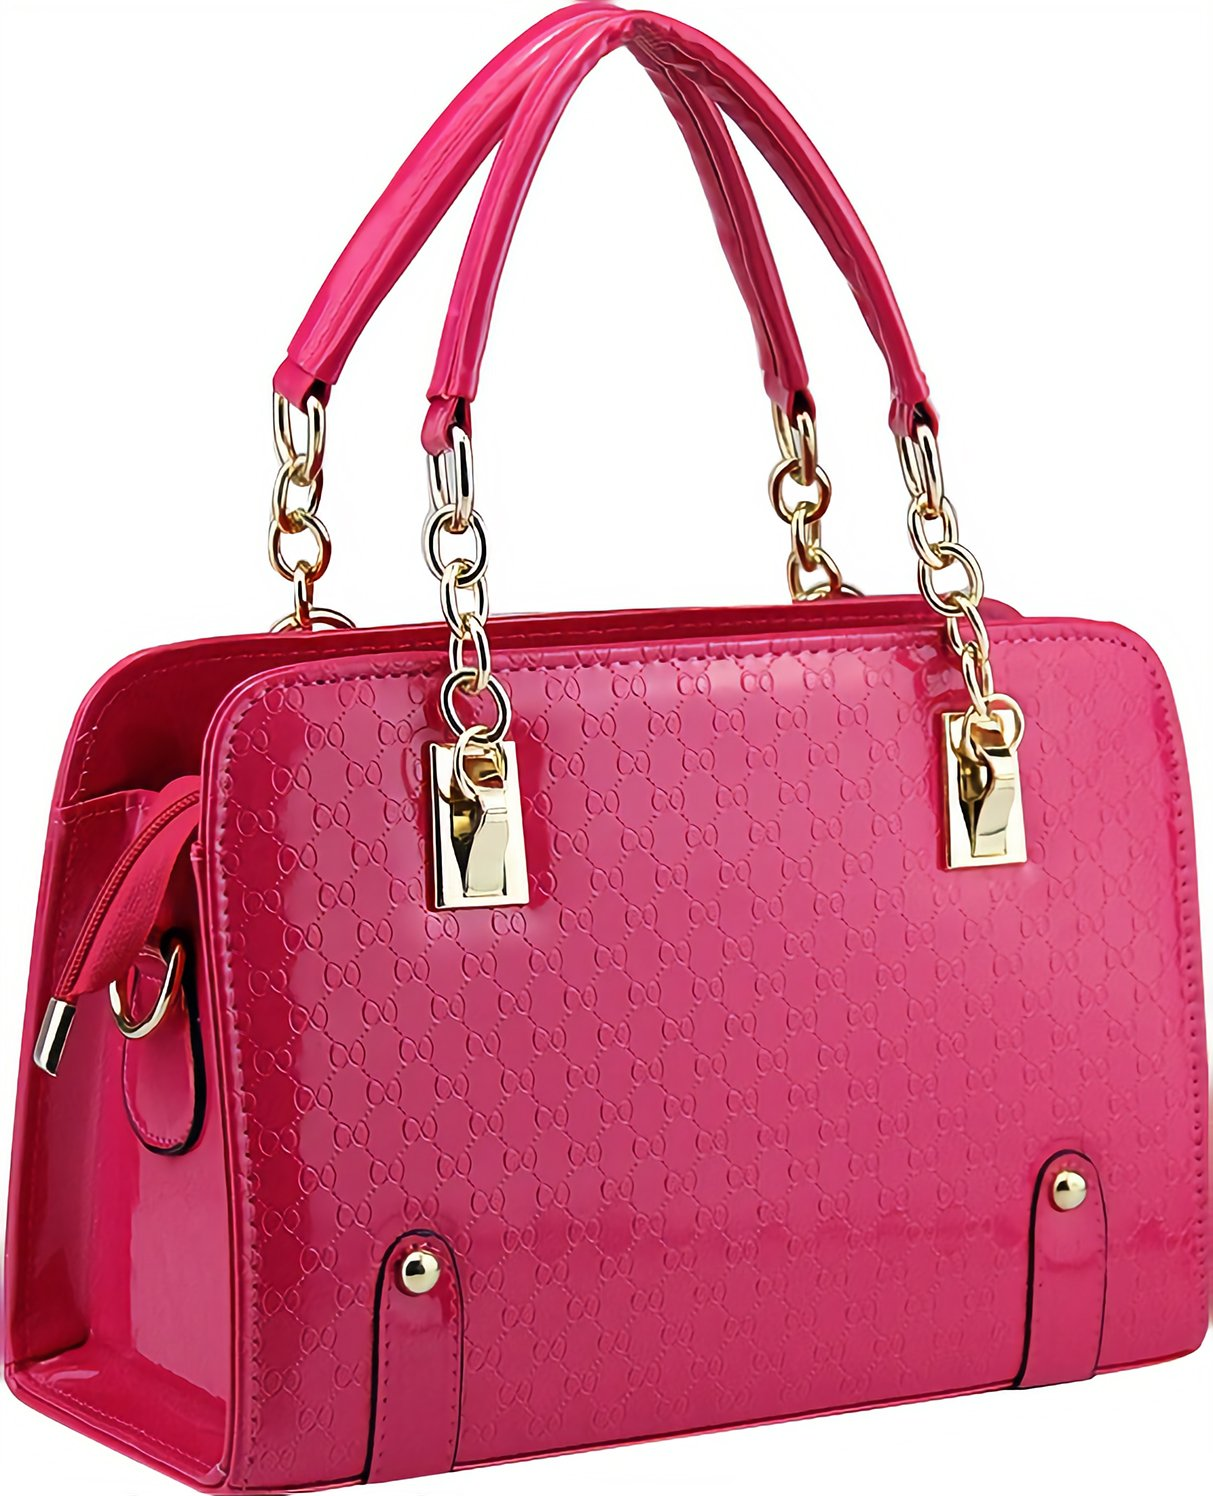 Women Elegant PU Hot Pink Leather Purses and Handbags Tote Bag Top-Handle Satche Ladies Pocketbook